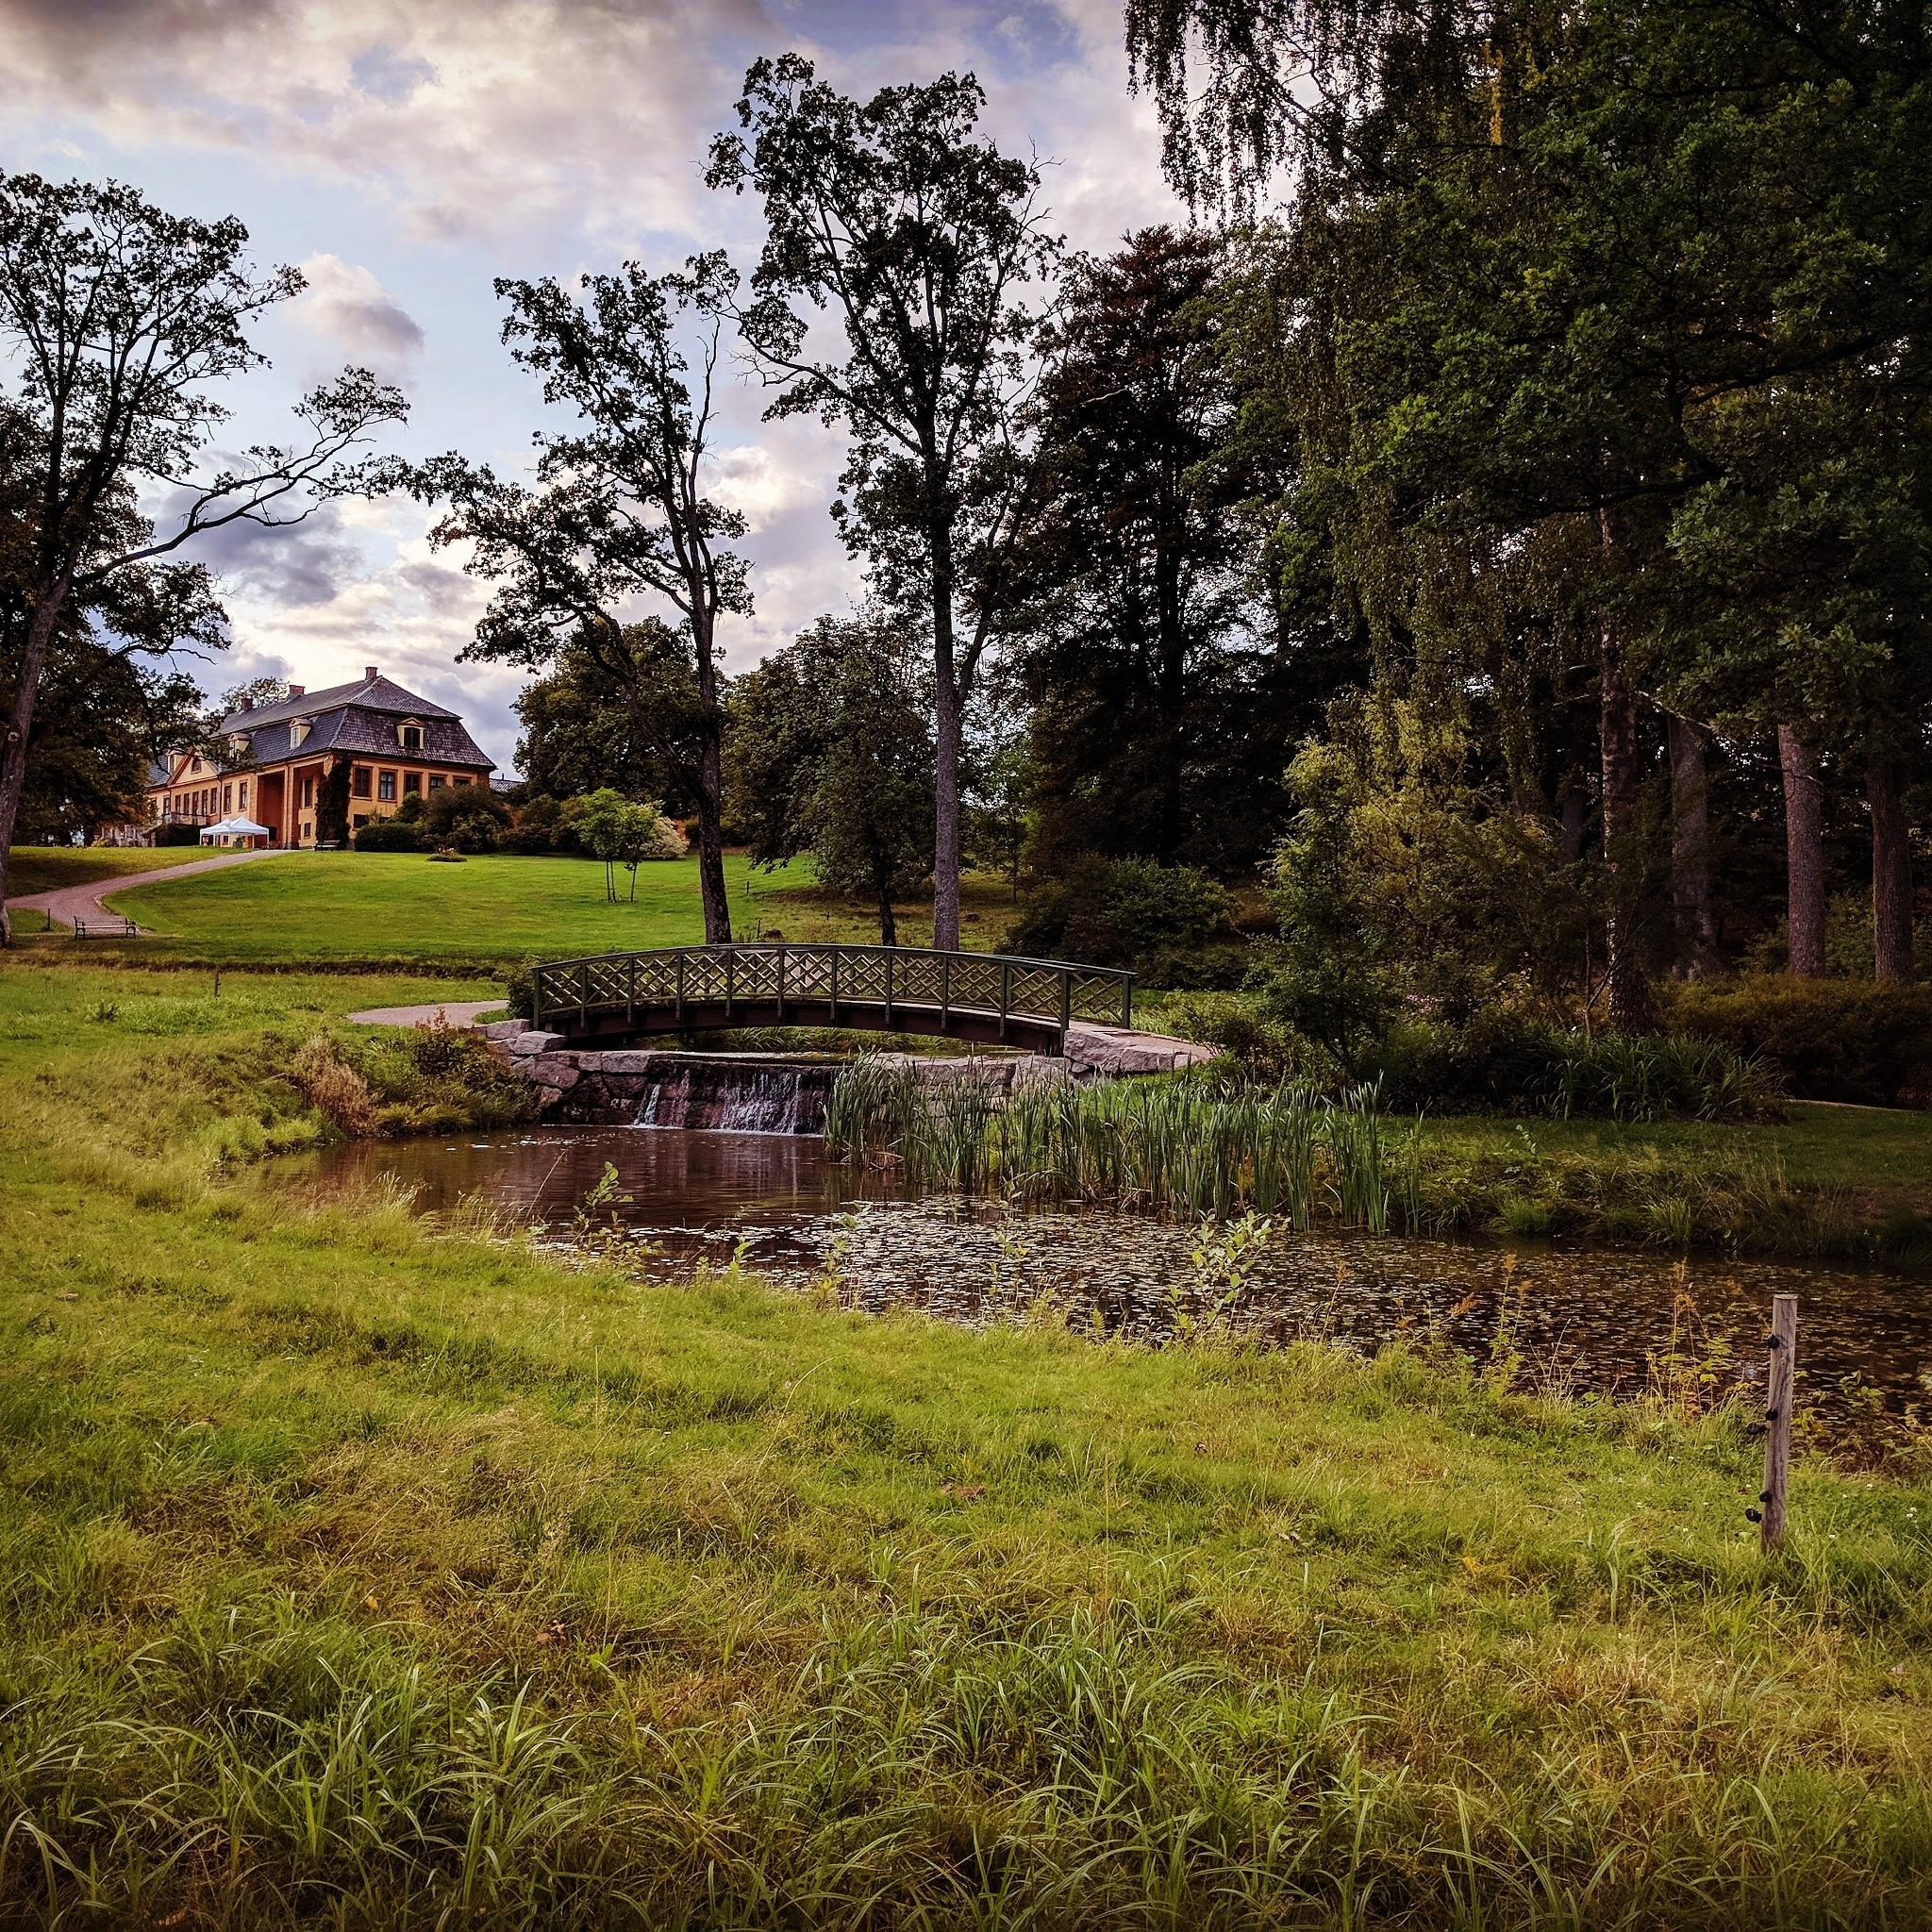 Bogstad gård, Norway by Deepak Kumar Swain